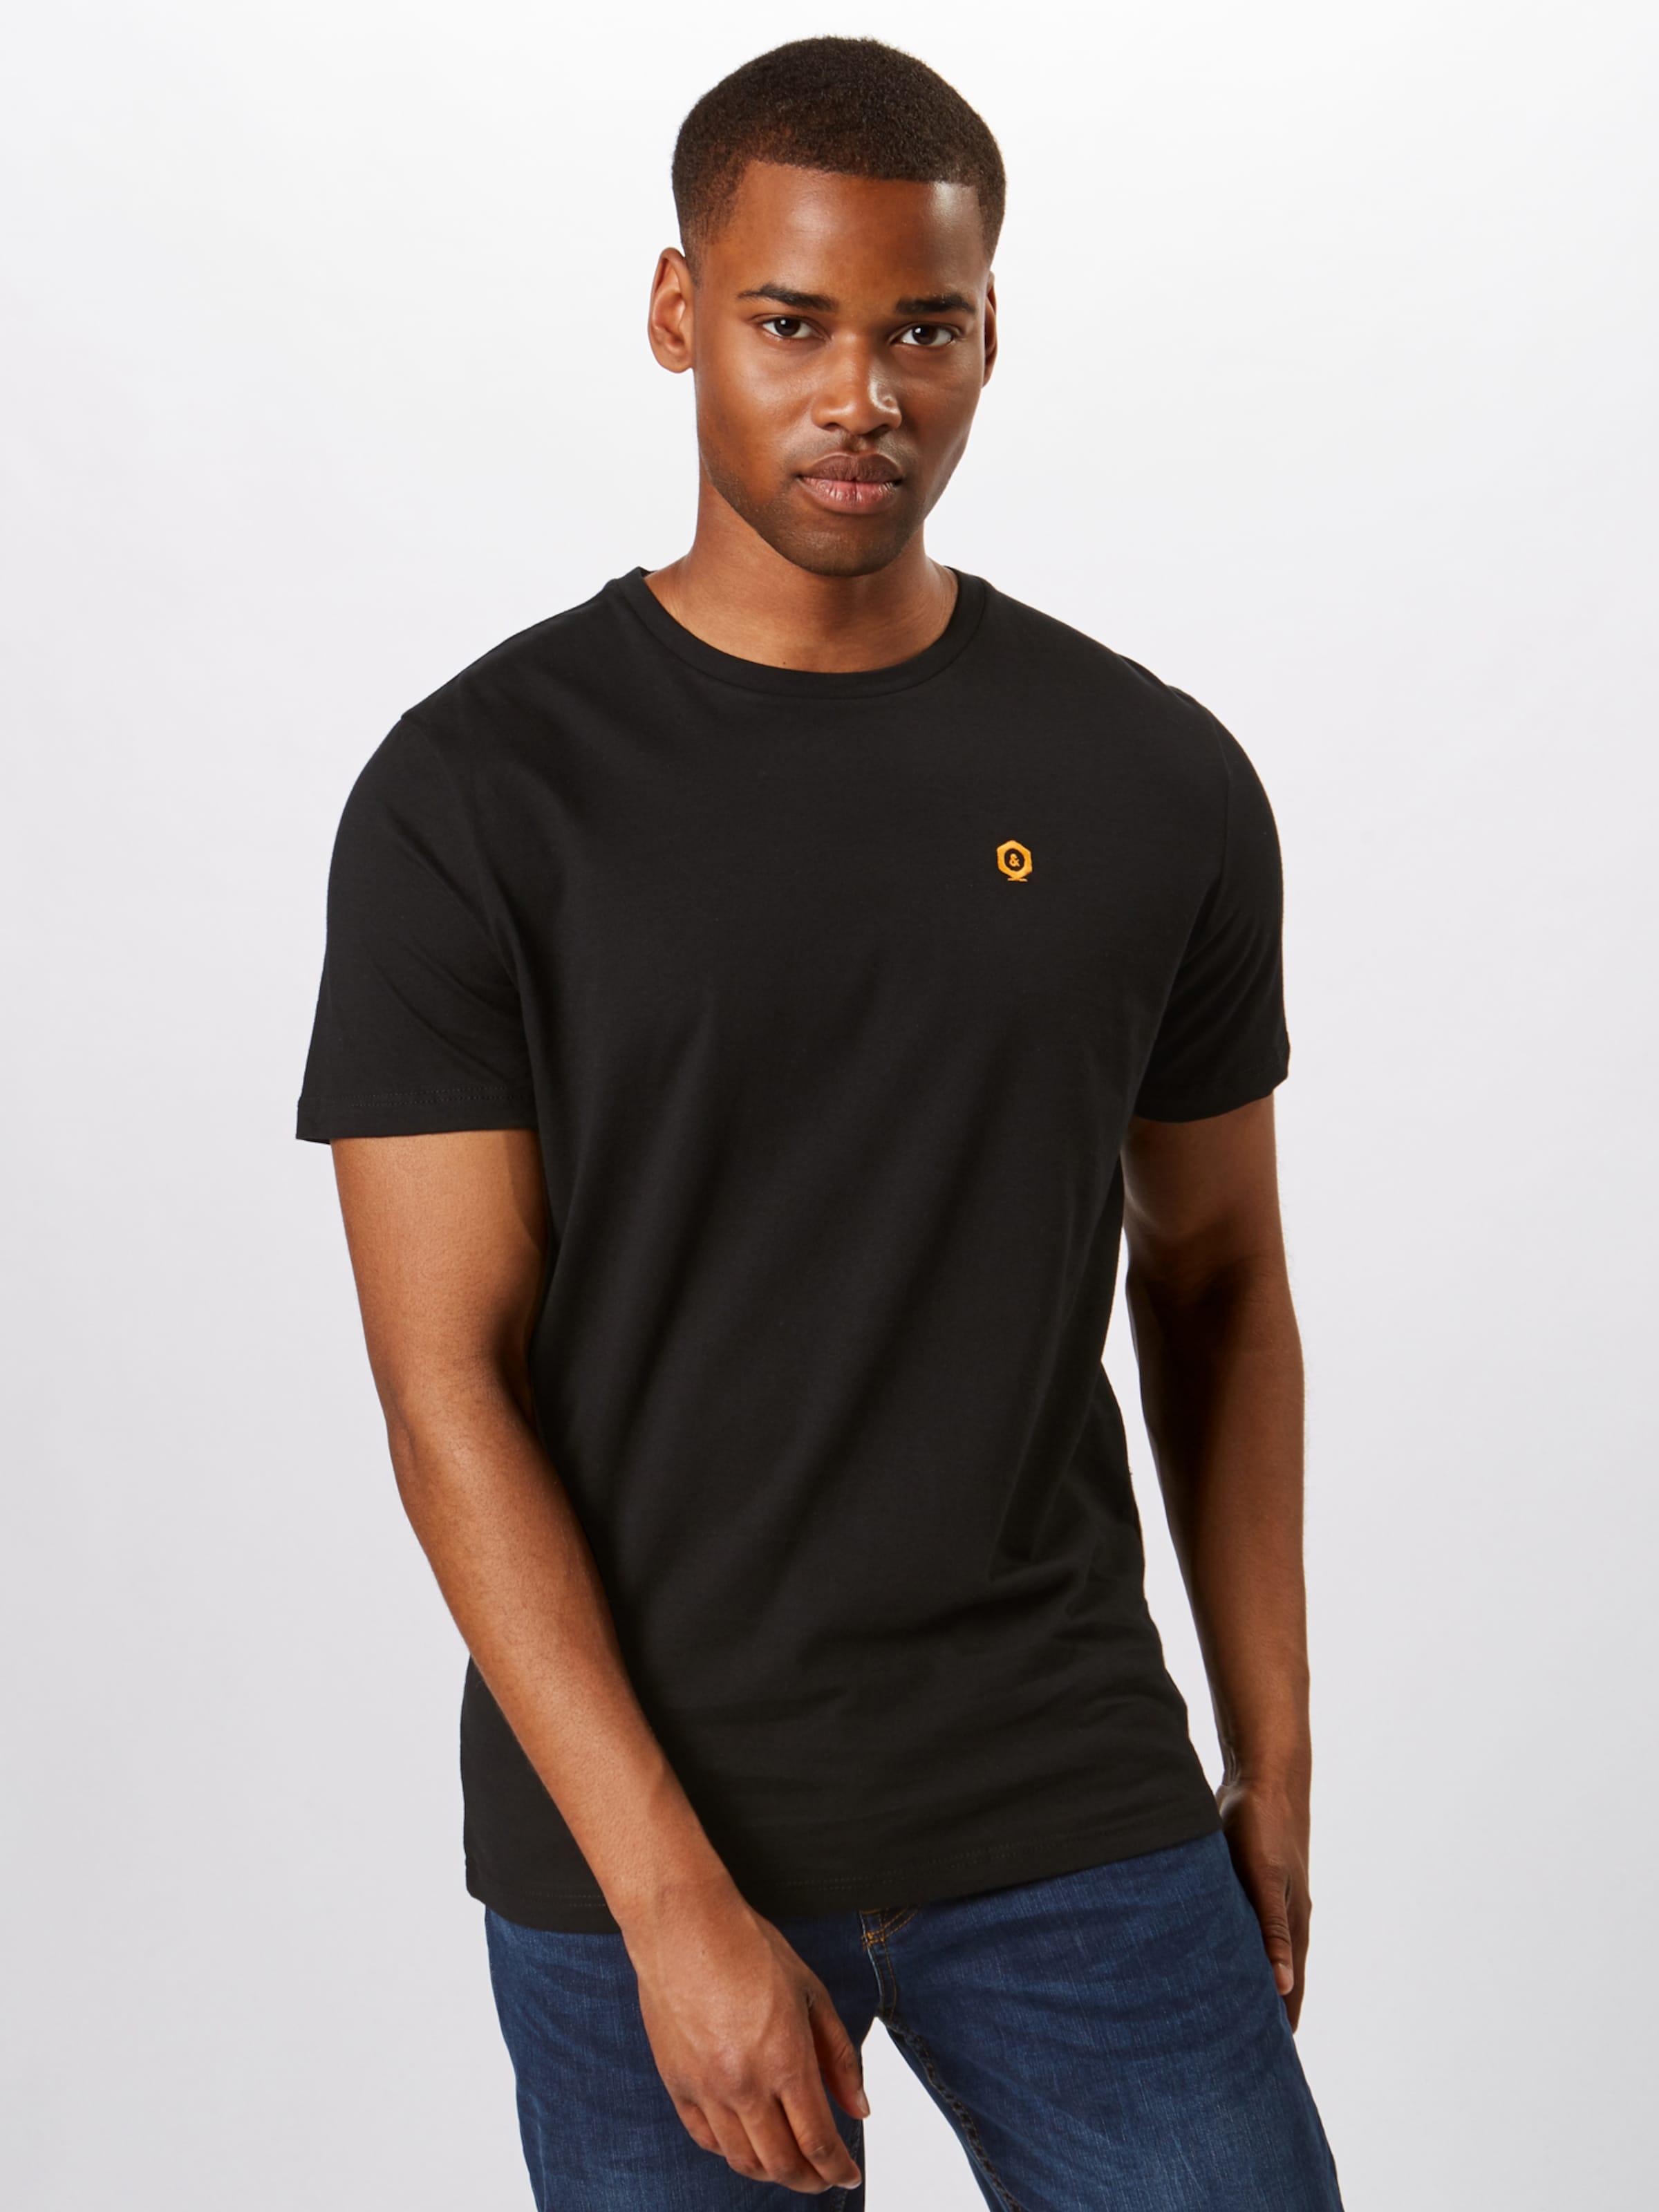 shirt Jackamp; In T 'jcoboston' Jones Schwarz trdxQBshC